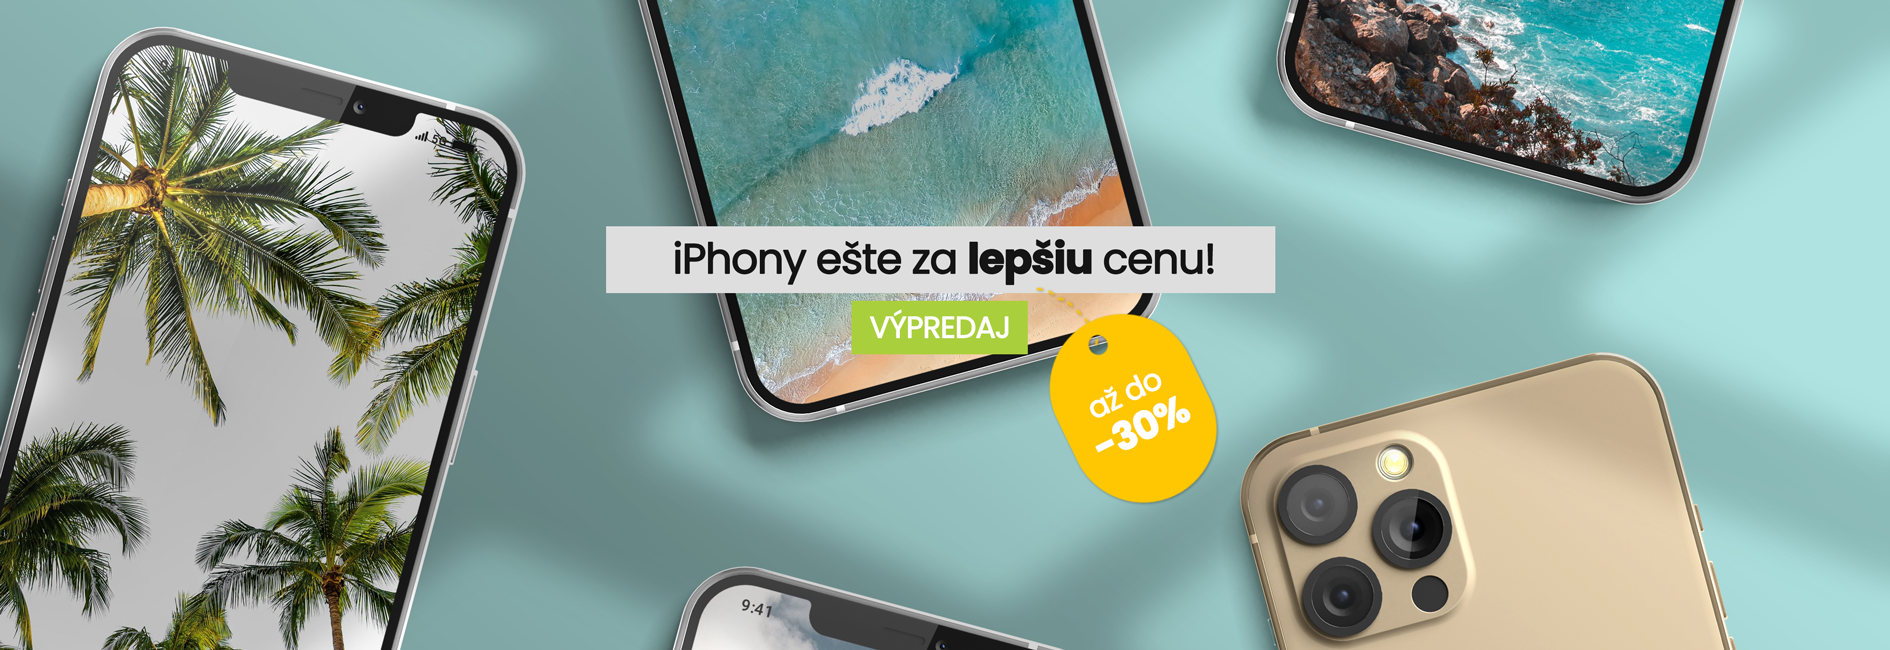 iPhony ešte za lepšiu cenu!